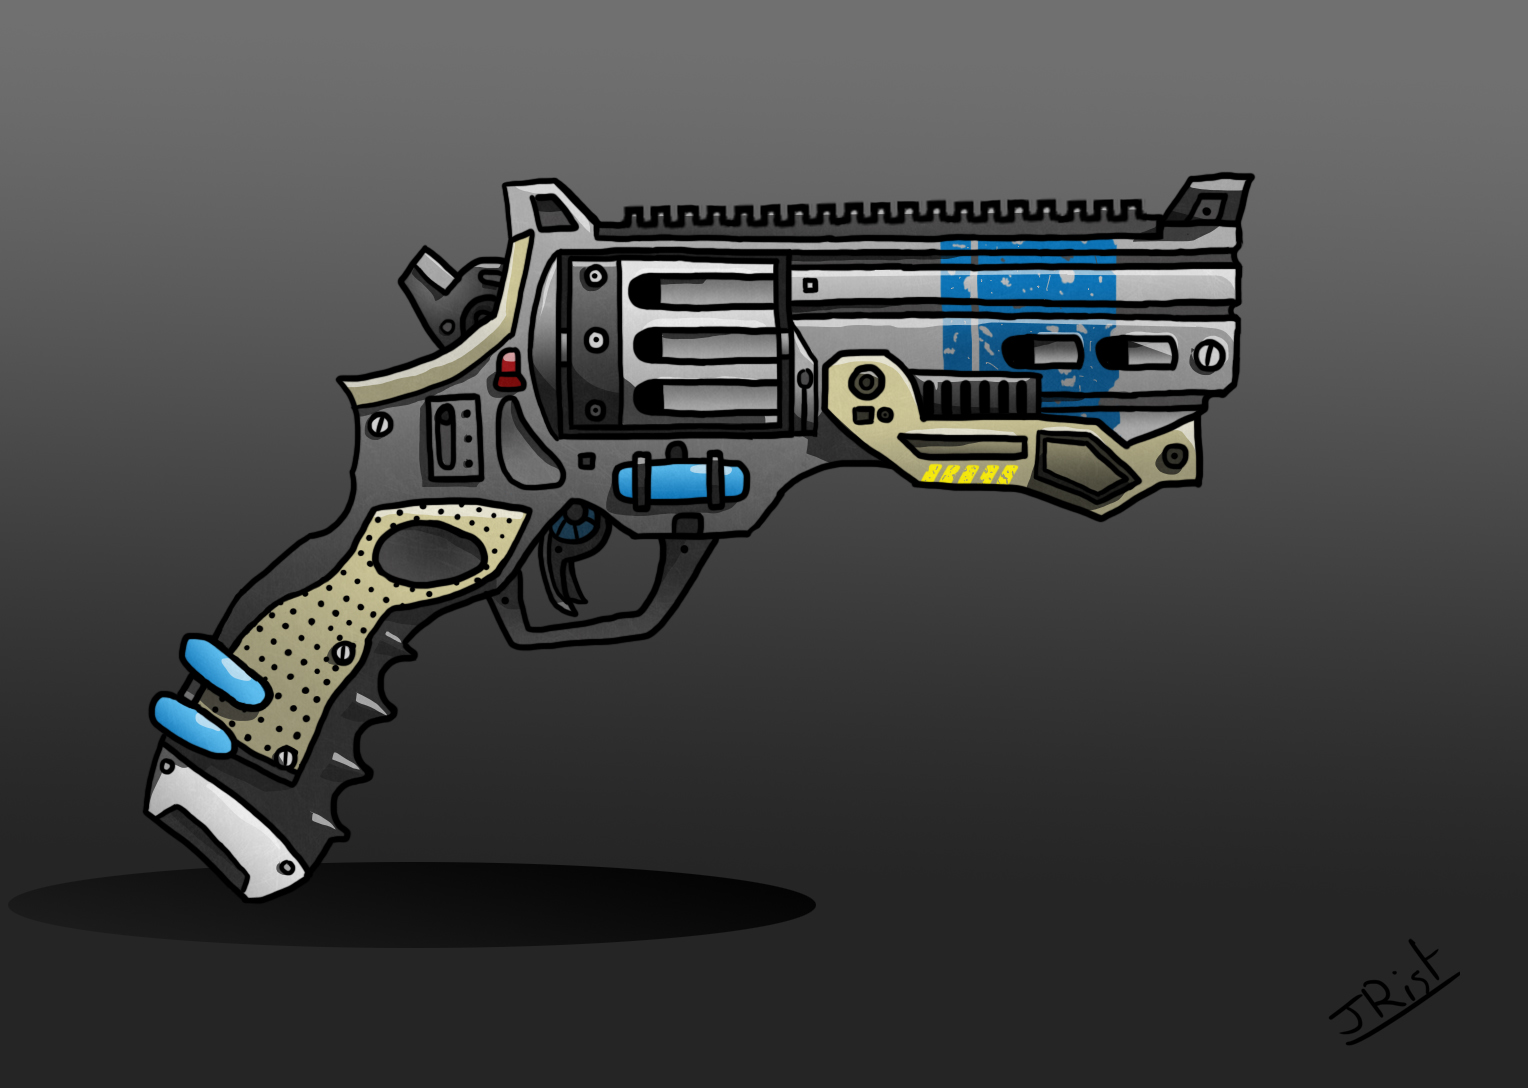 Futuristic Revolver by RistWorks on Newgrounds